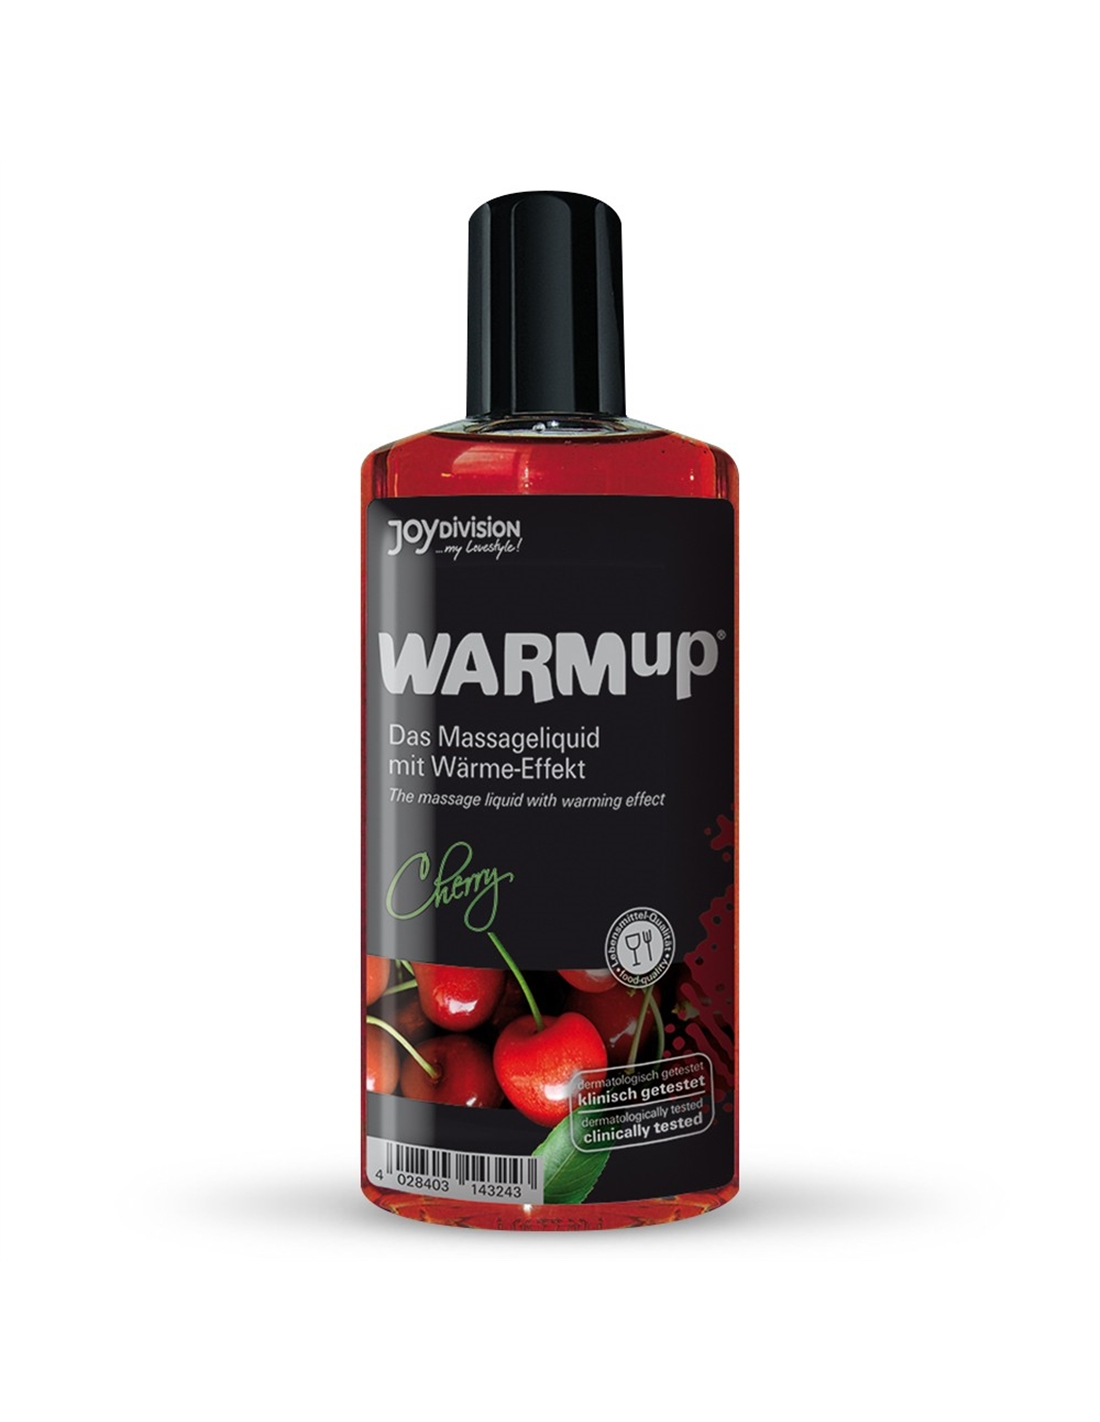 Warmup Cereja - DO29005007